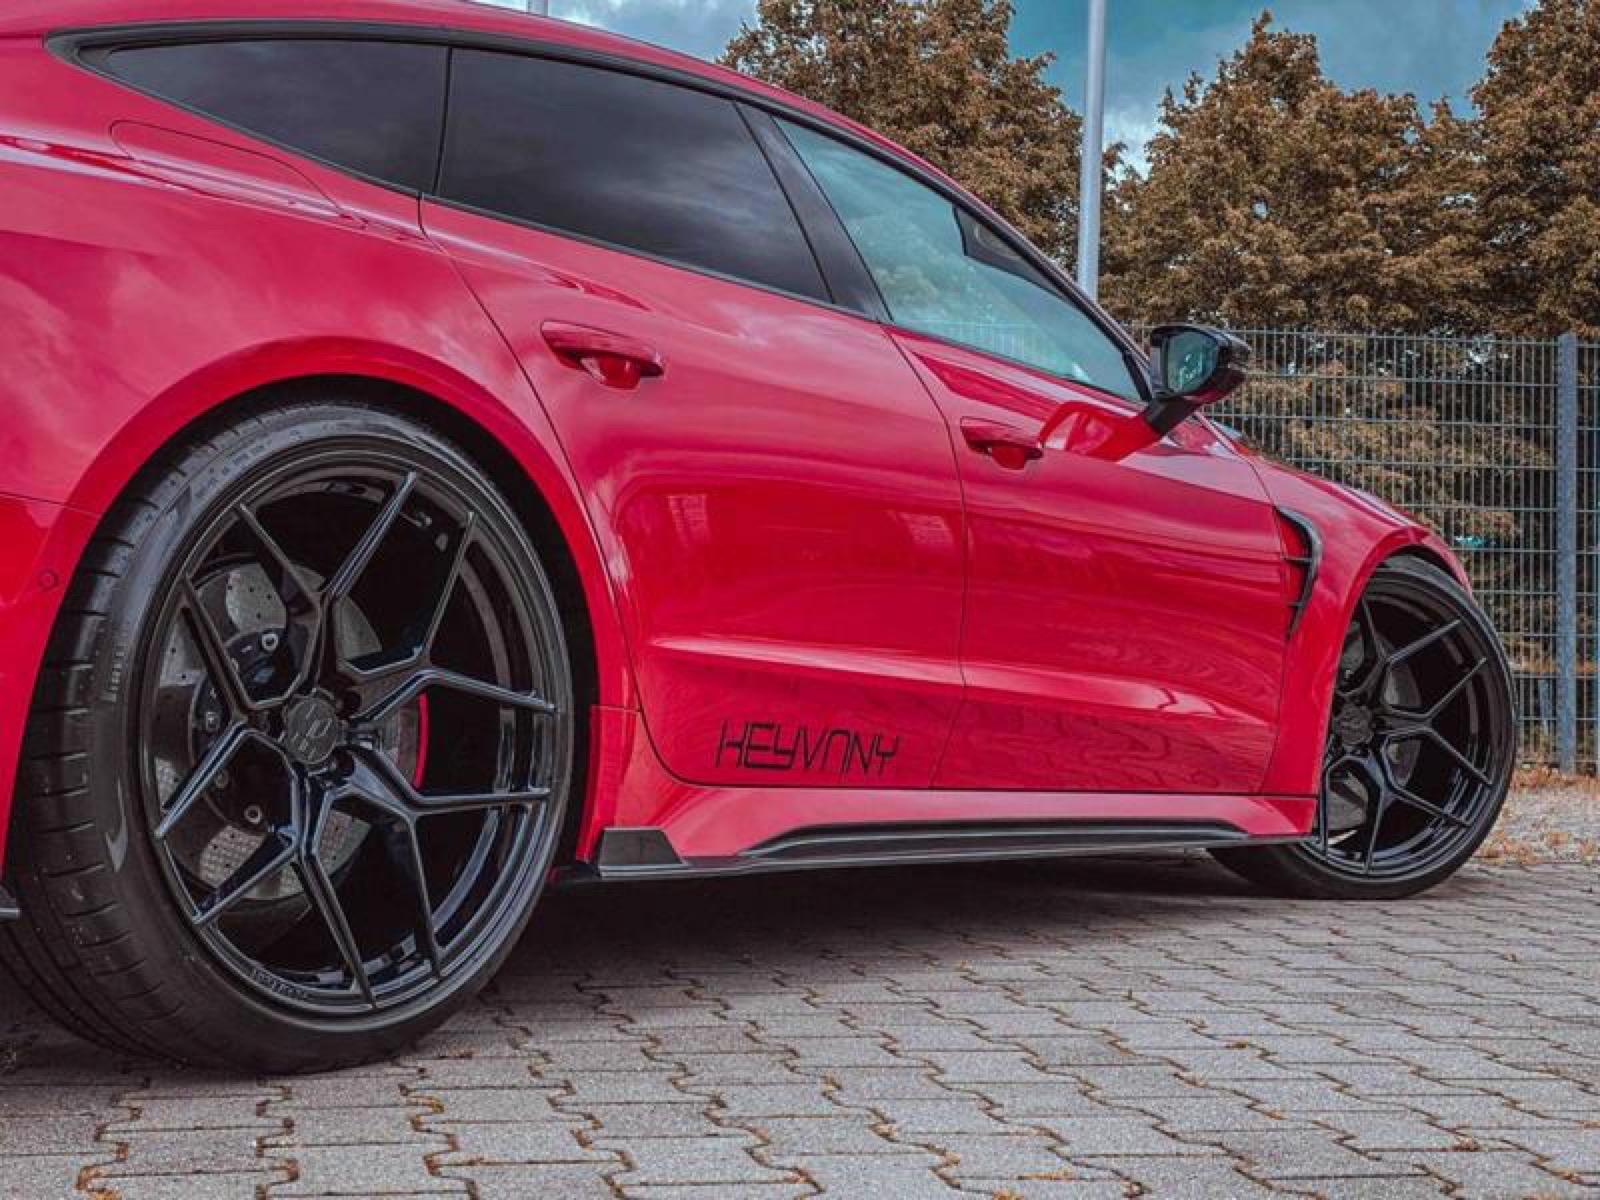 Audi-RS7-by-Keyvany-13